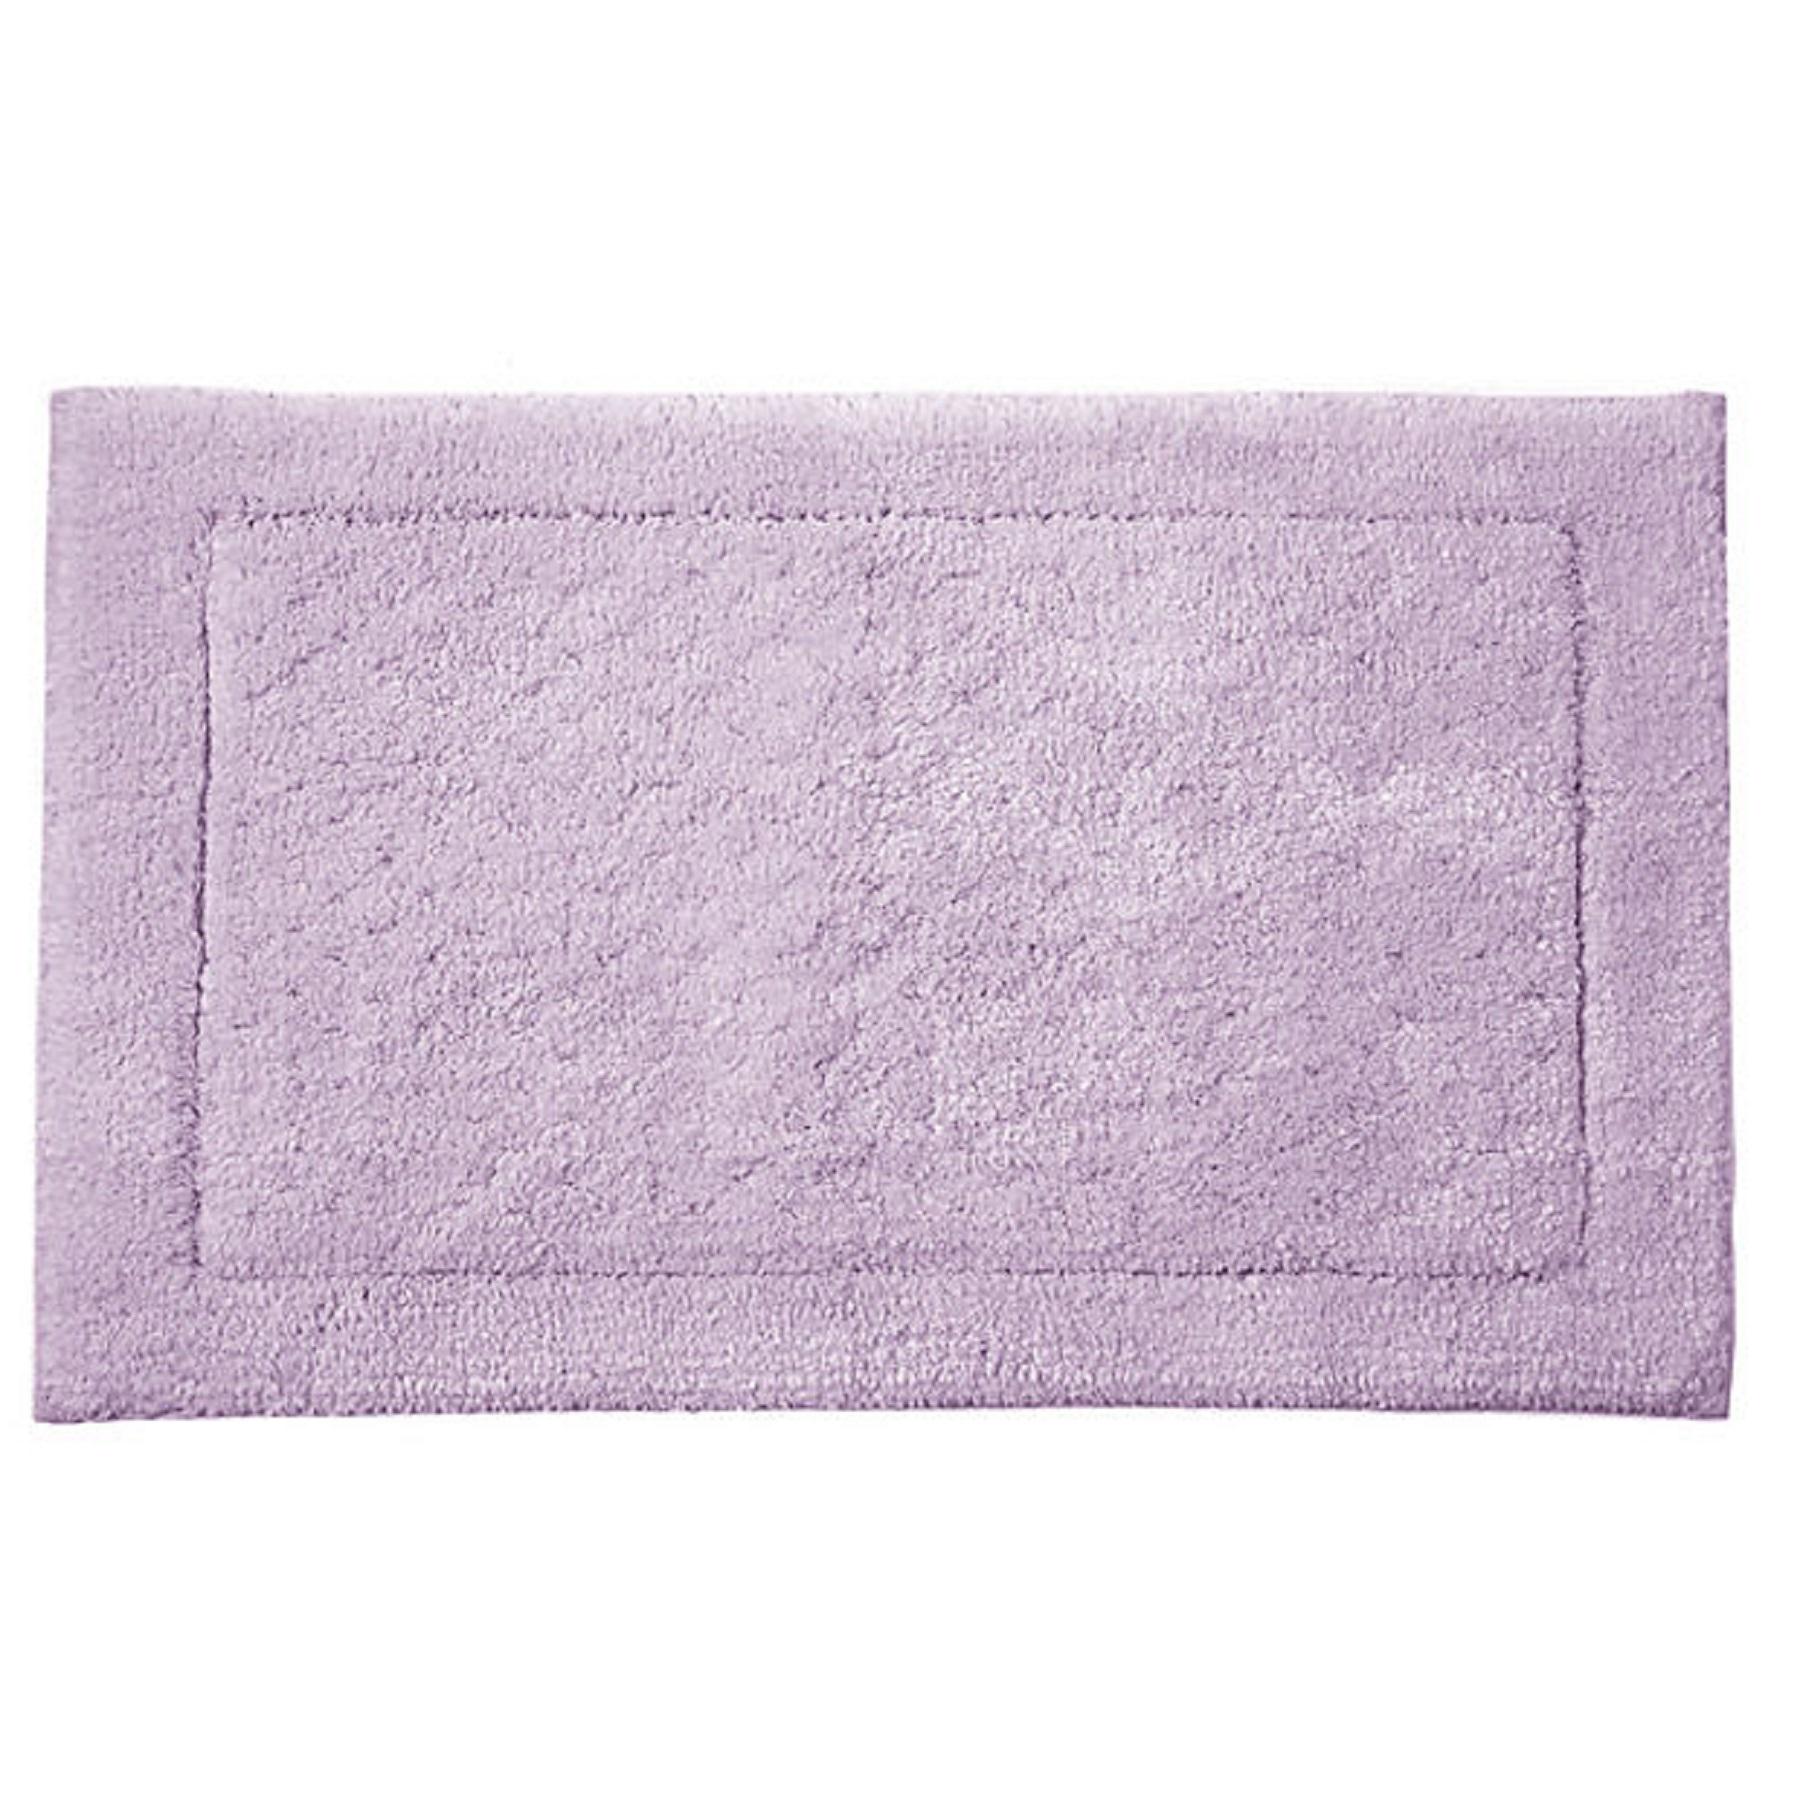 Коврики для ванной Коврик для ванной 61х101 Sublime Lavender Frost SLM-630-LVF.jpg